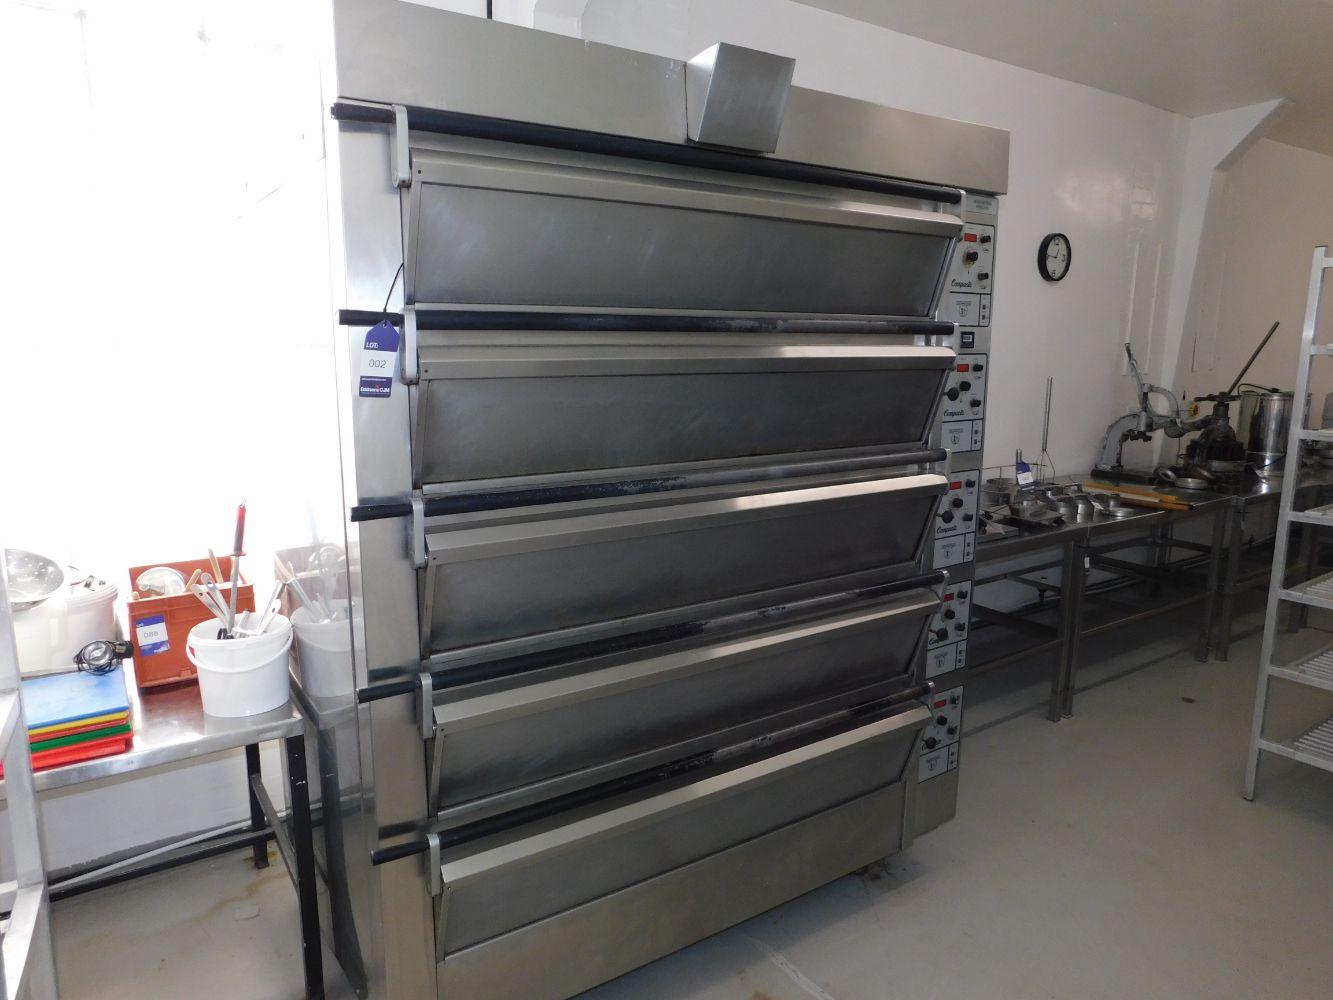 Bakery & Pie Making Equipment - Burbush Penrith Limited (Proposed Liquidation)